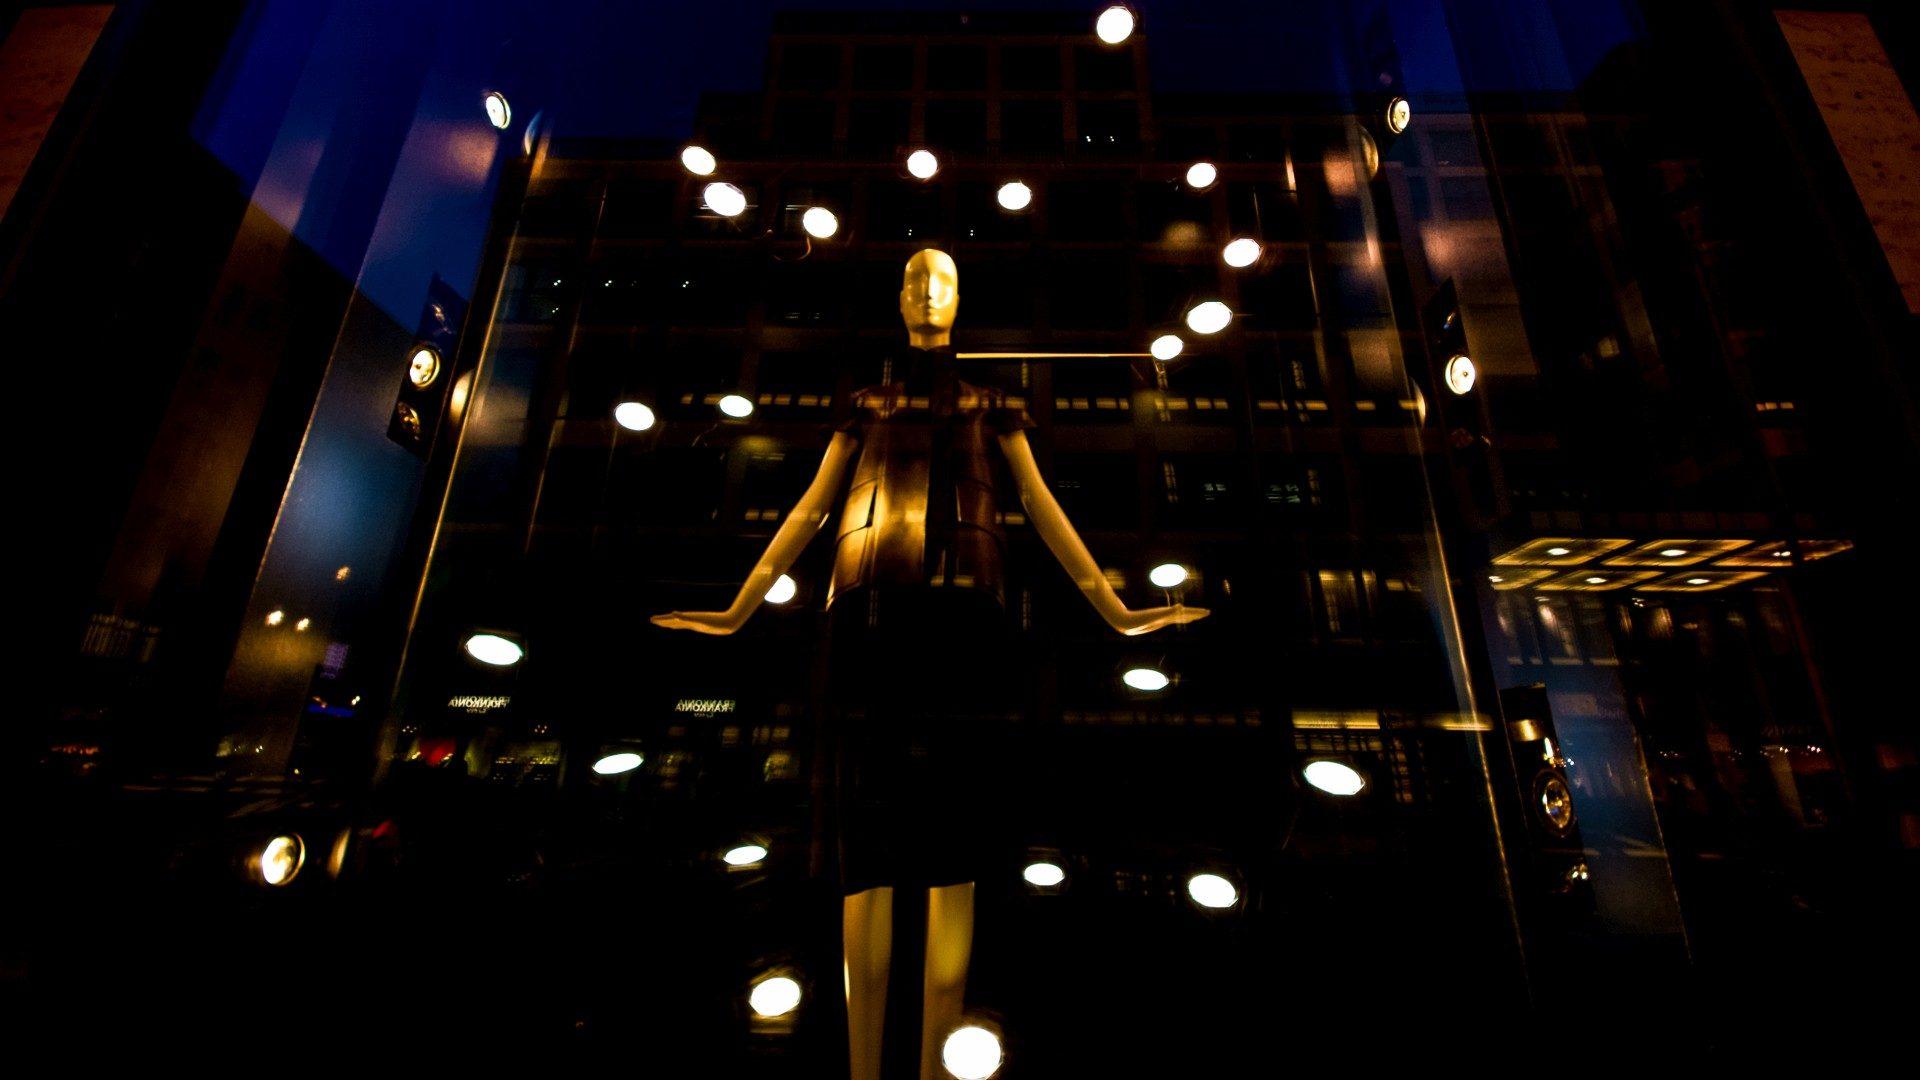 Schaufenster-Beleuchtung